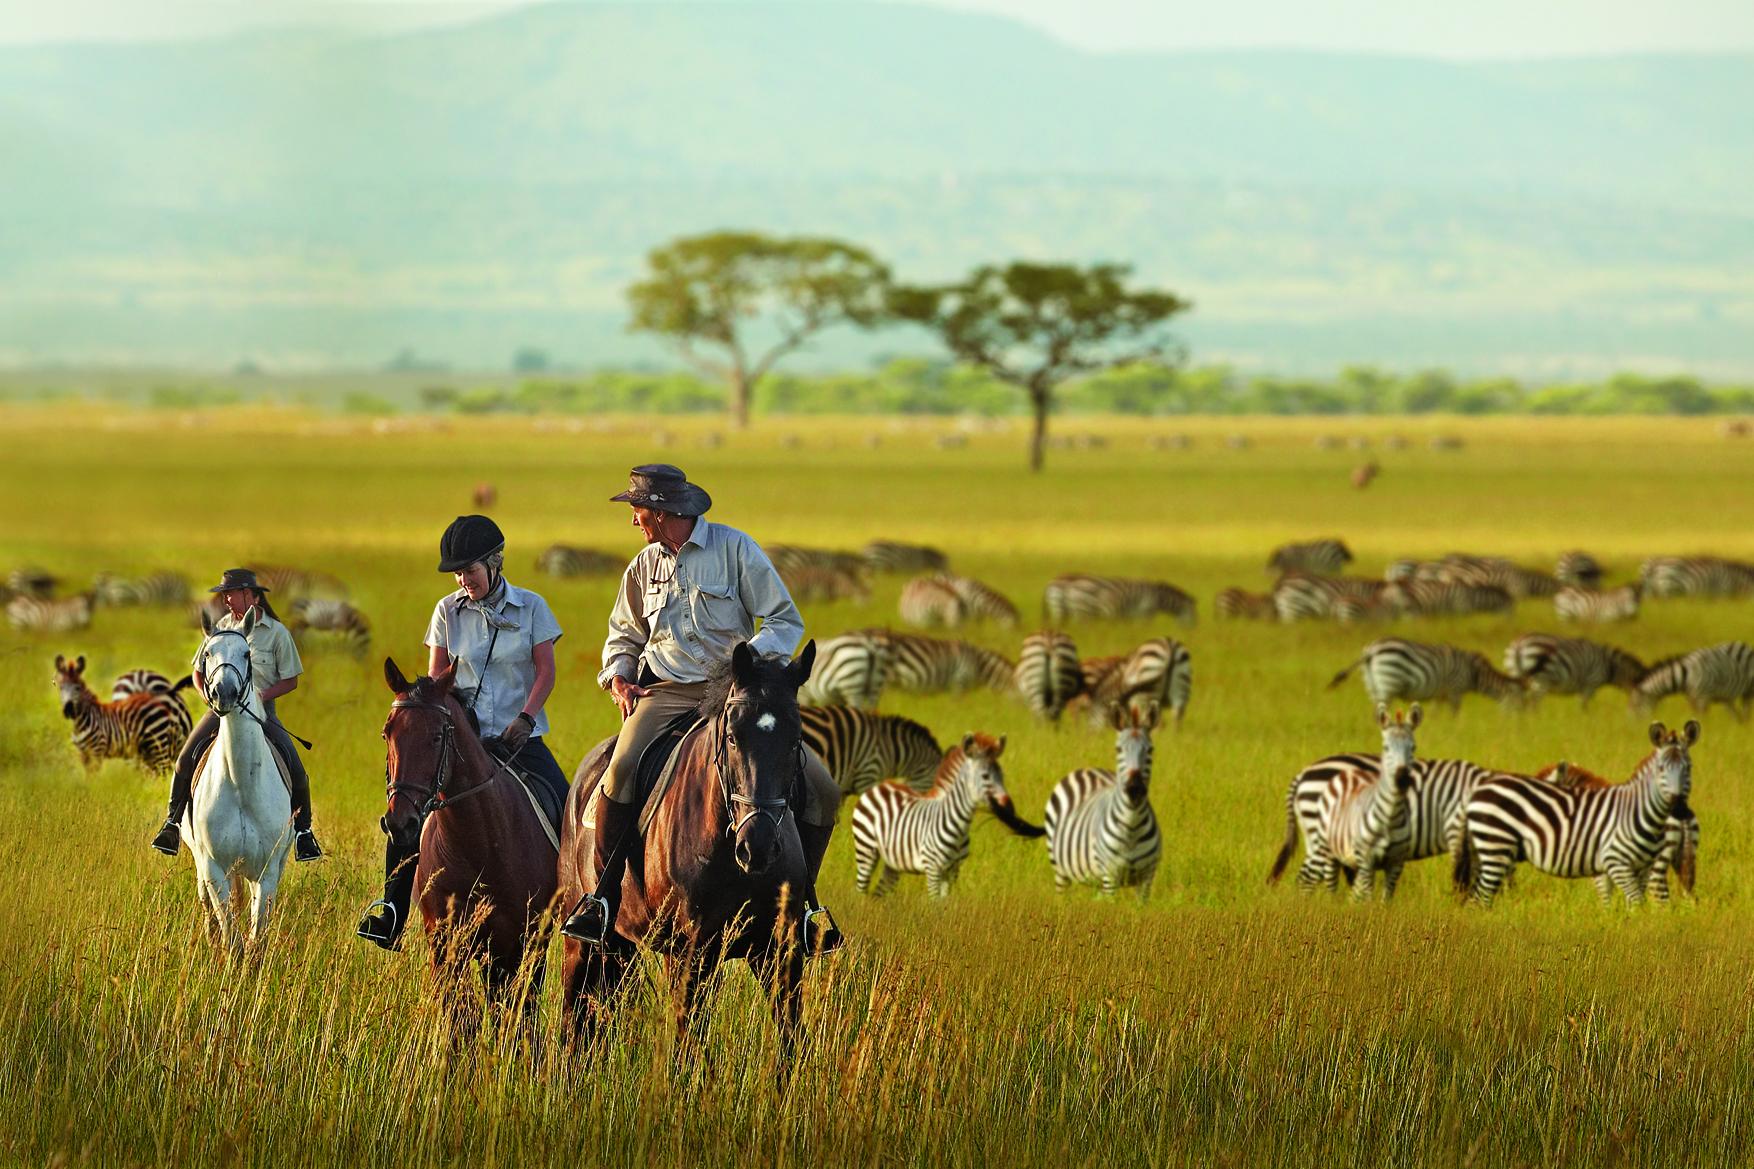 Safari te paard in Tanzania - Vakantie te paard / Reisbureau Perlan